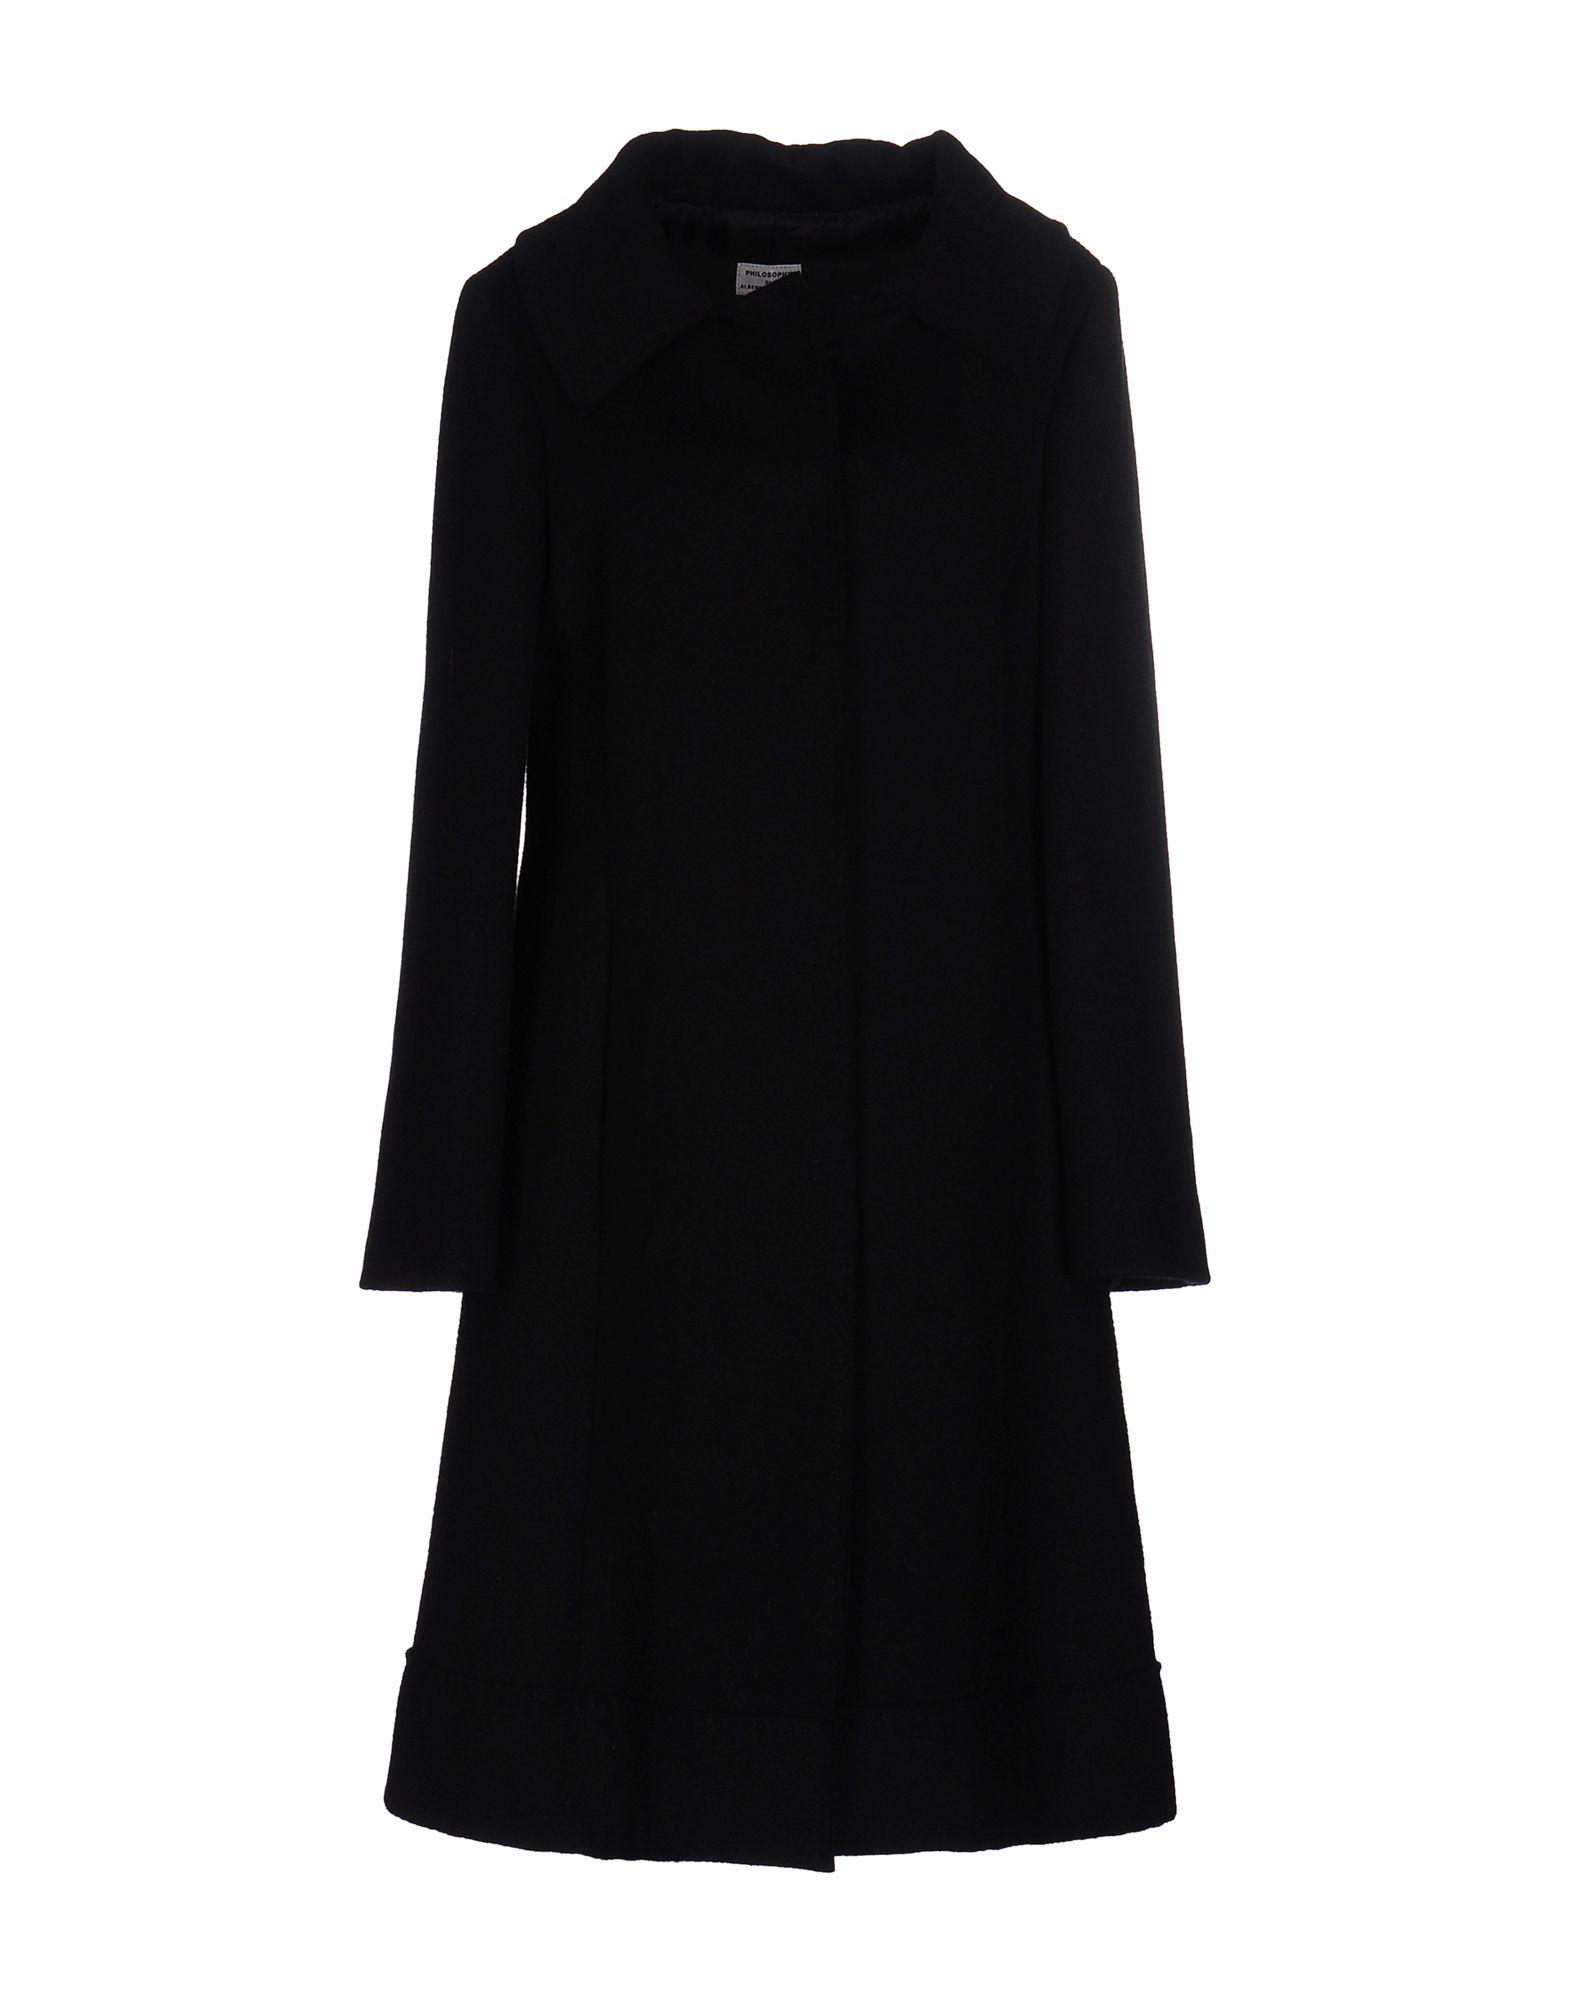 PHILOSOPHY DI ALBERTA FERRETTI Full-Length Jacket in Black